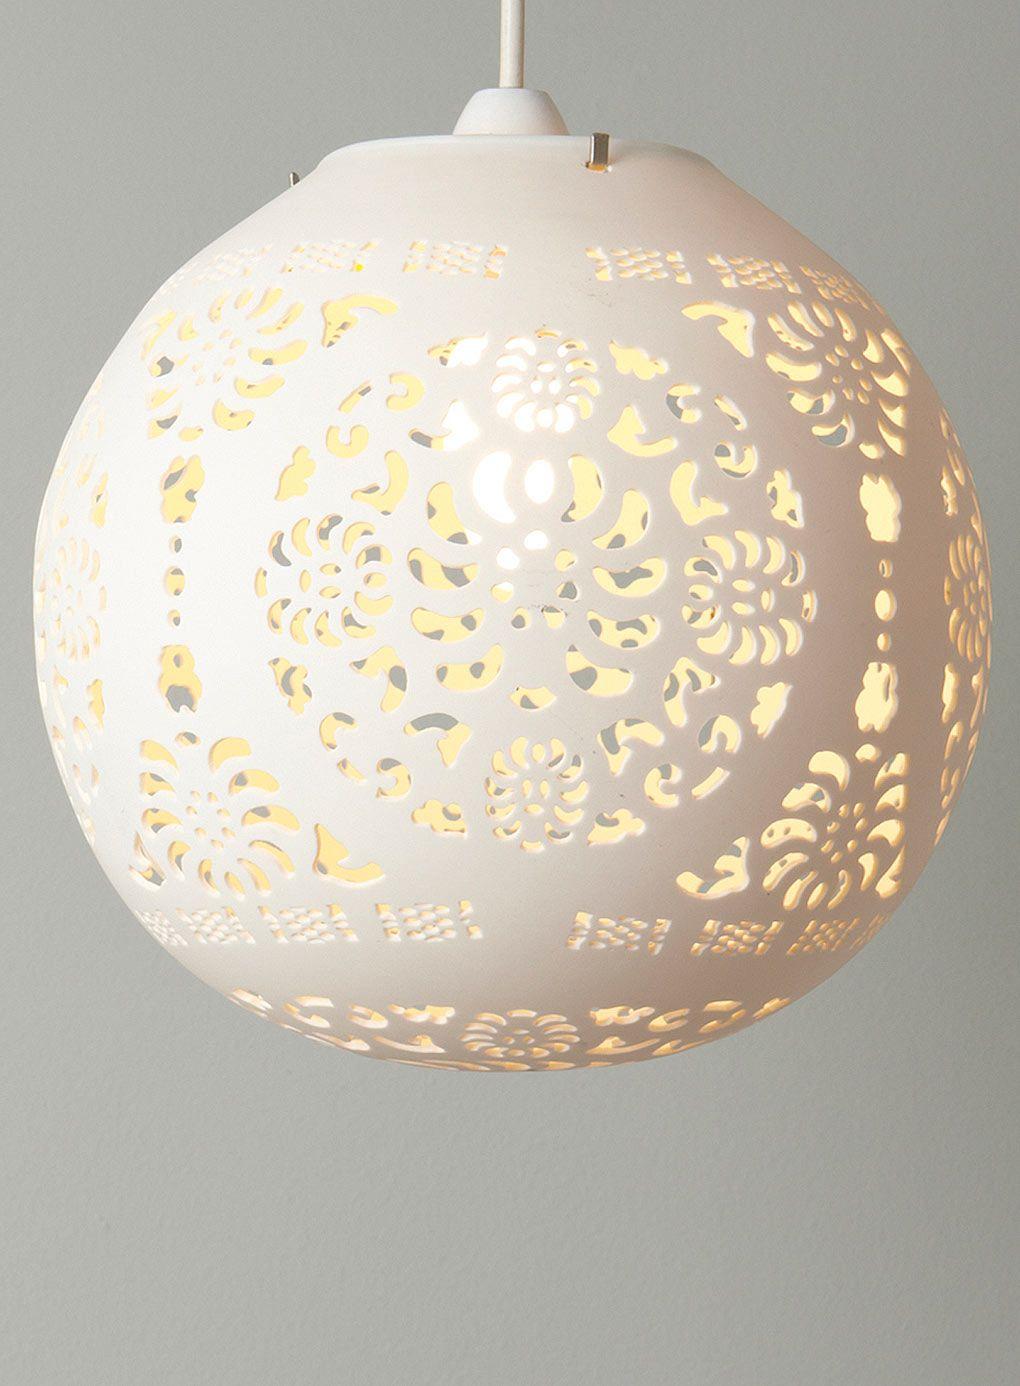 Bedroom Ceiling Lights Bhs : Alida ball easyfit ceiling light